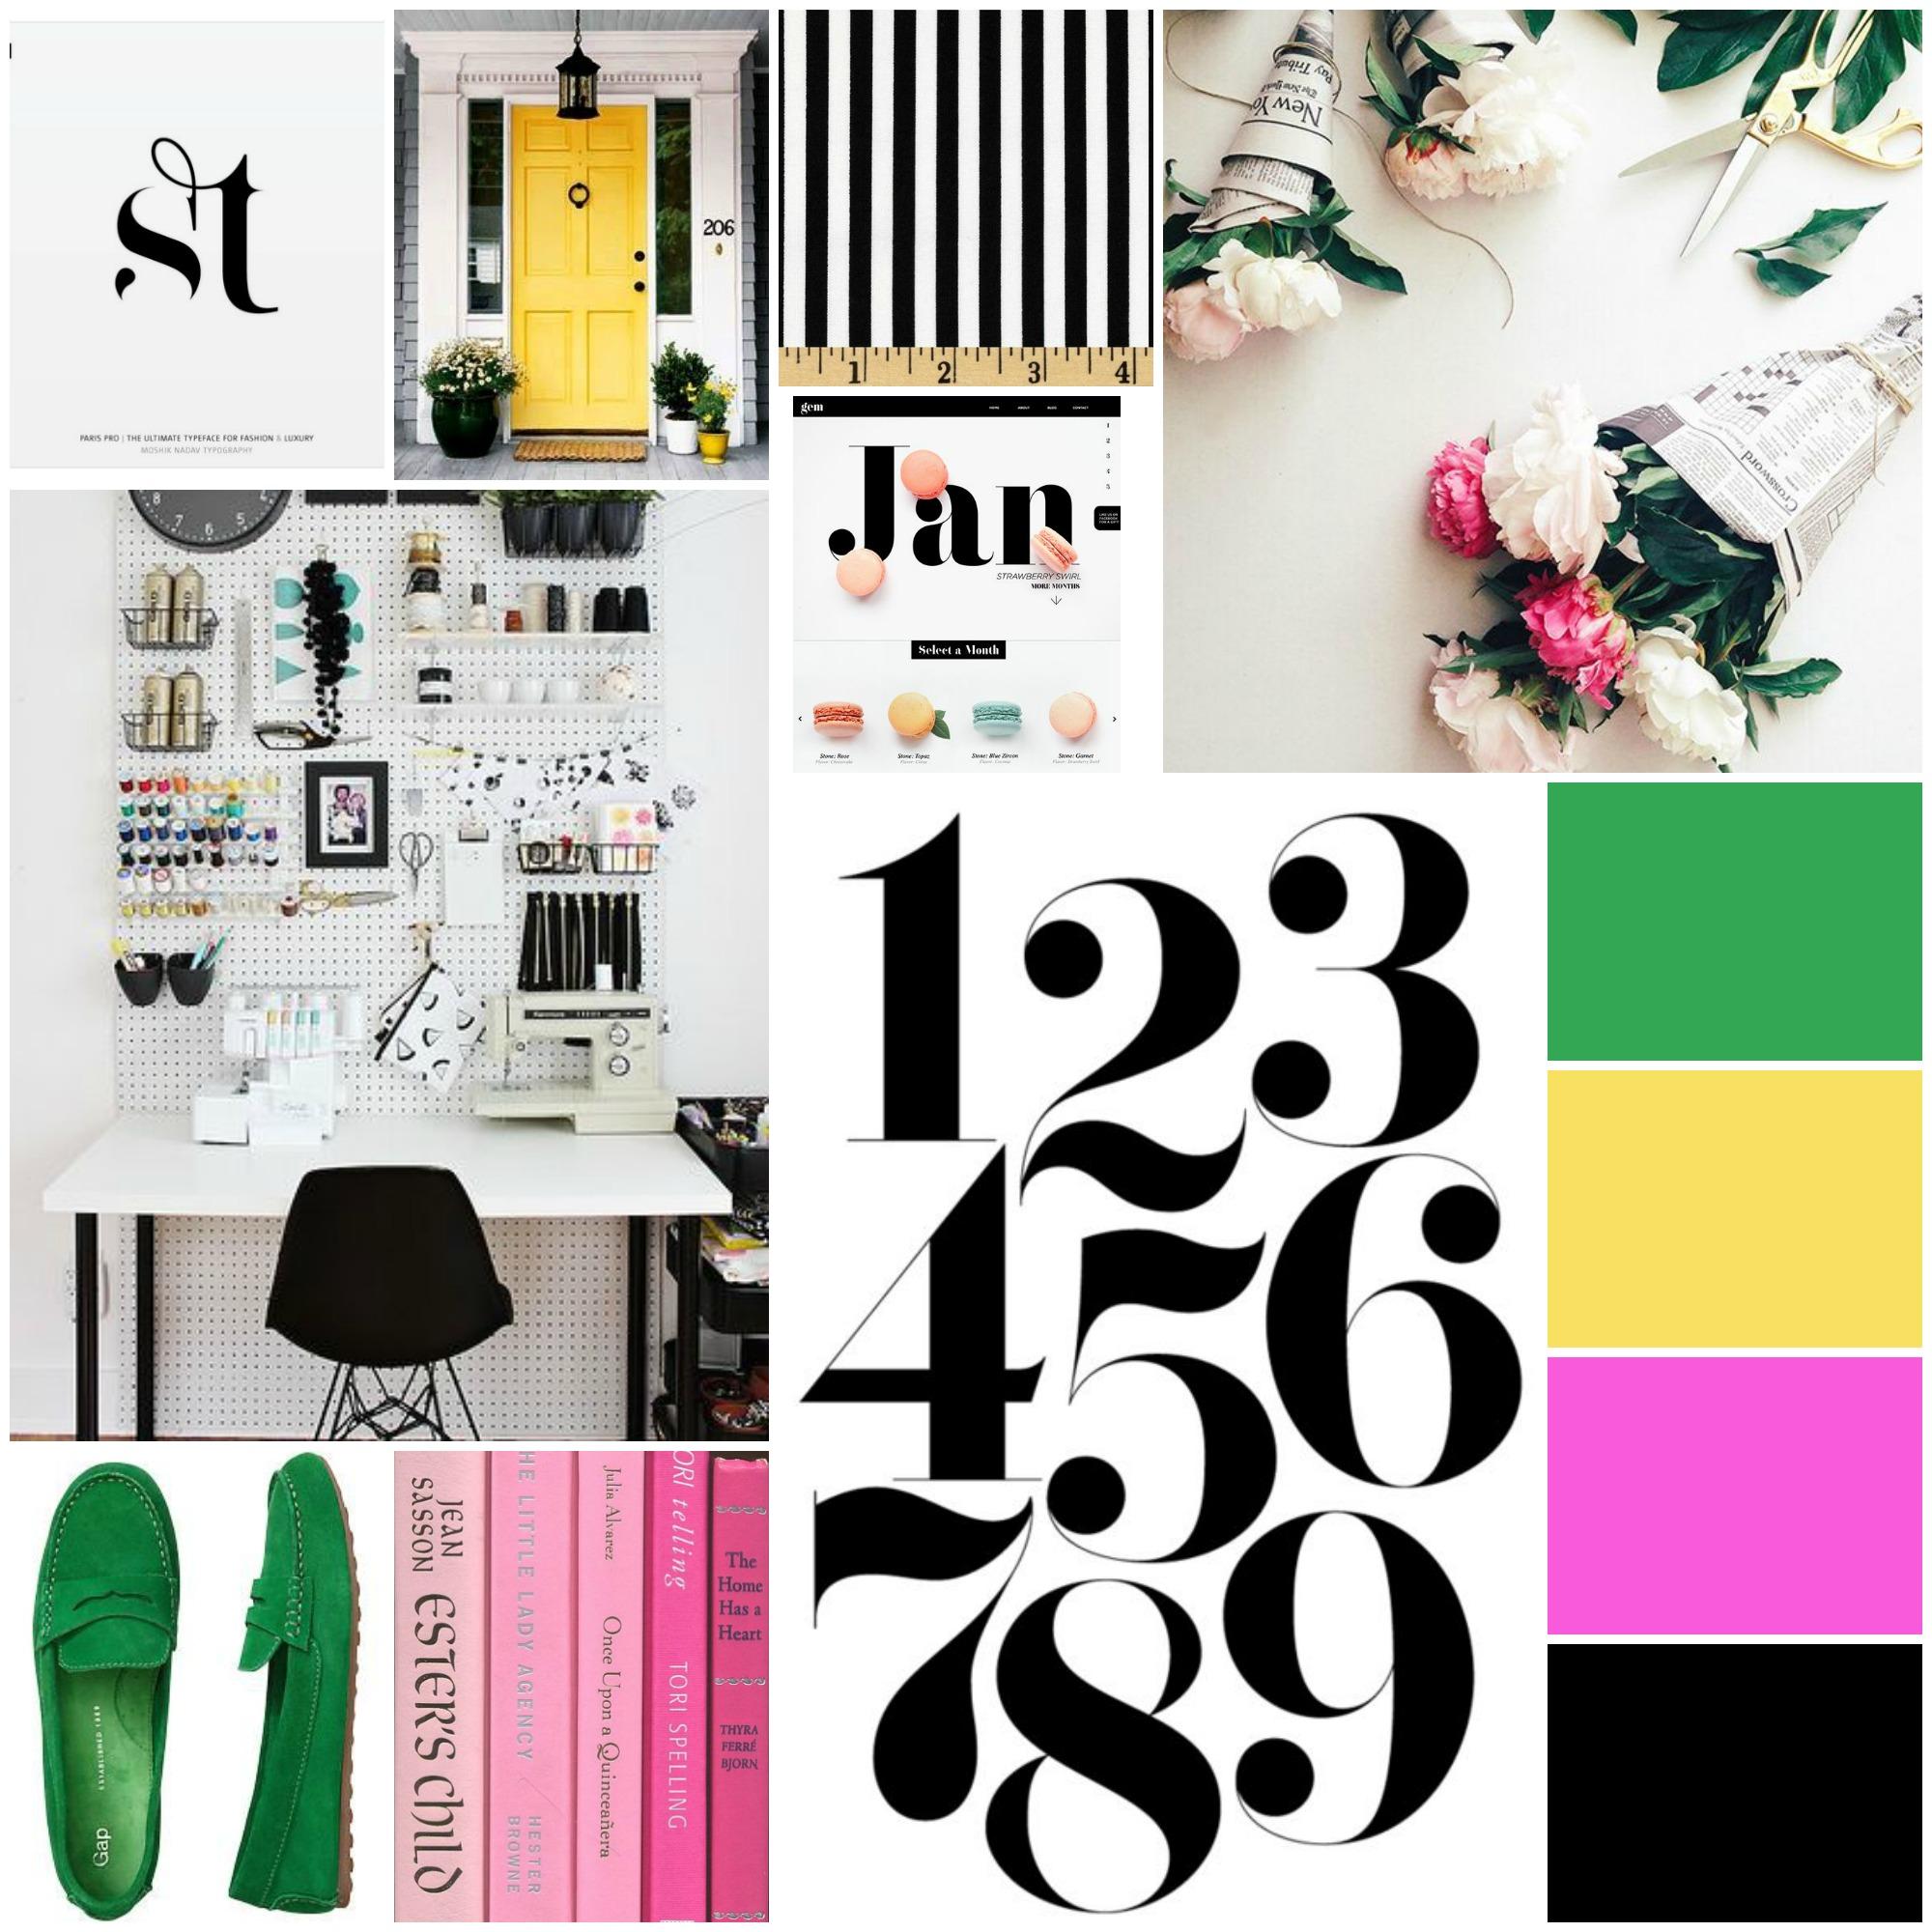 Belong Magazine Brand Inspiration Board - fonts, colors, graphics, design, logo